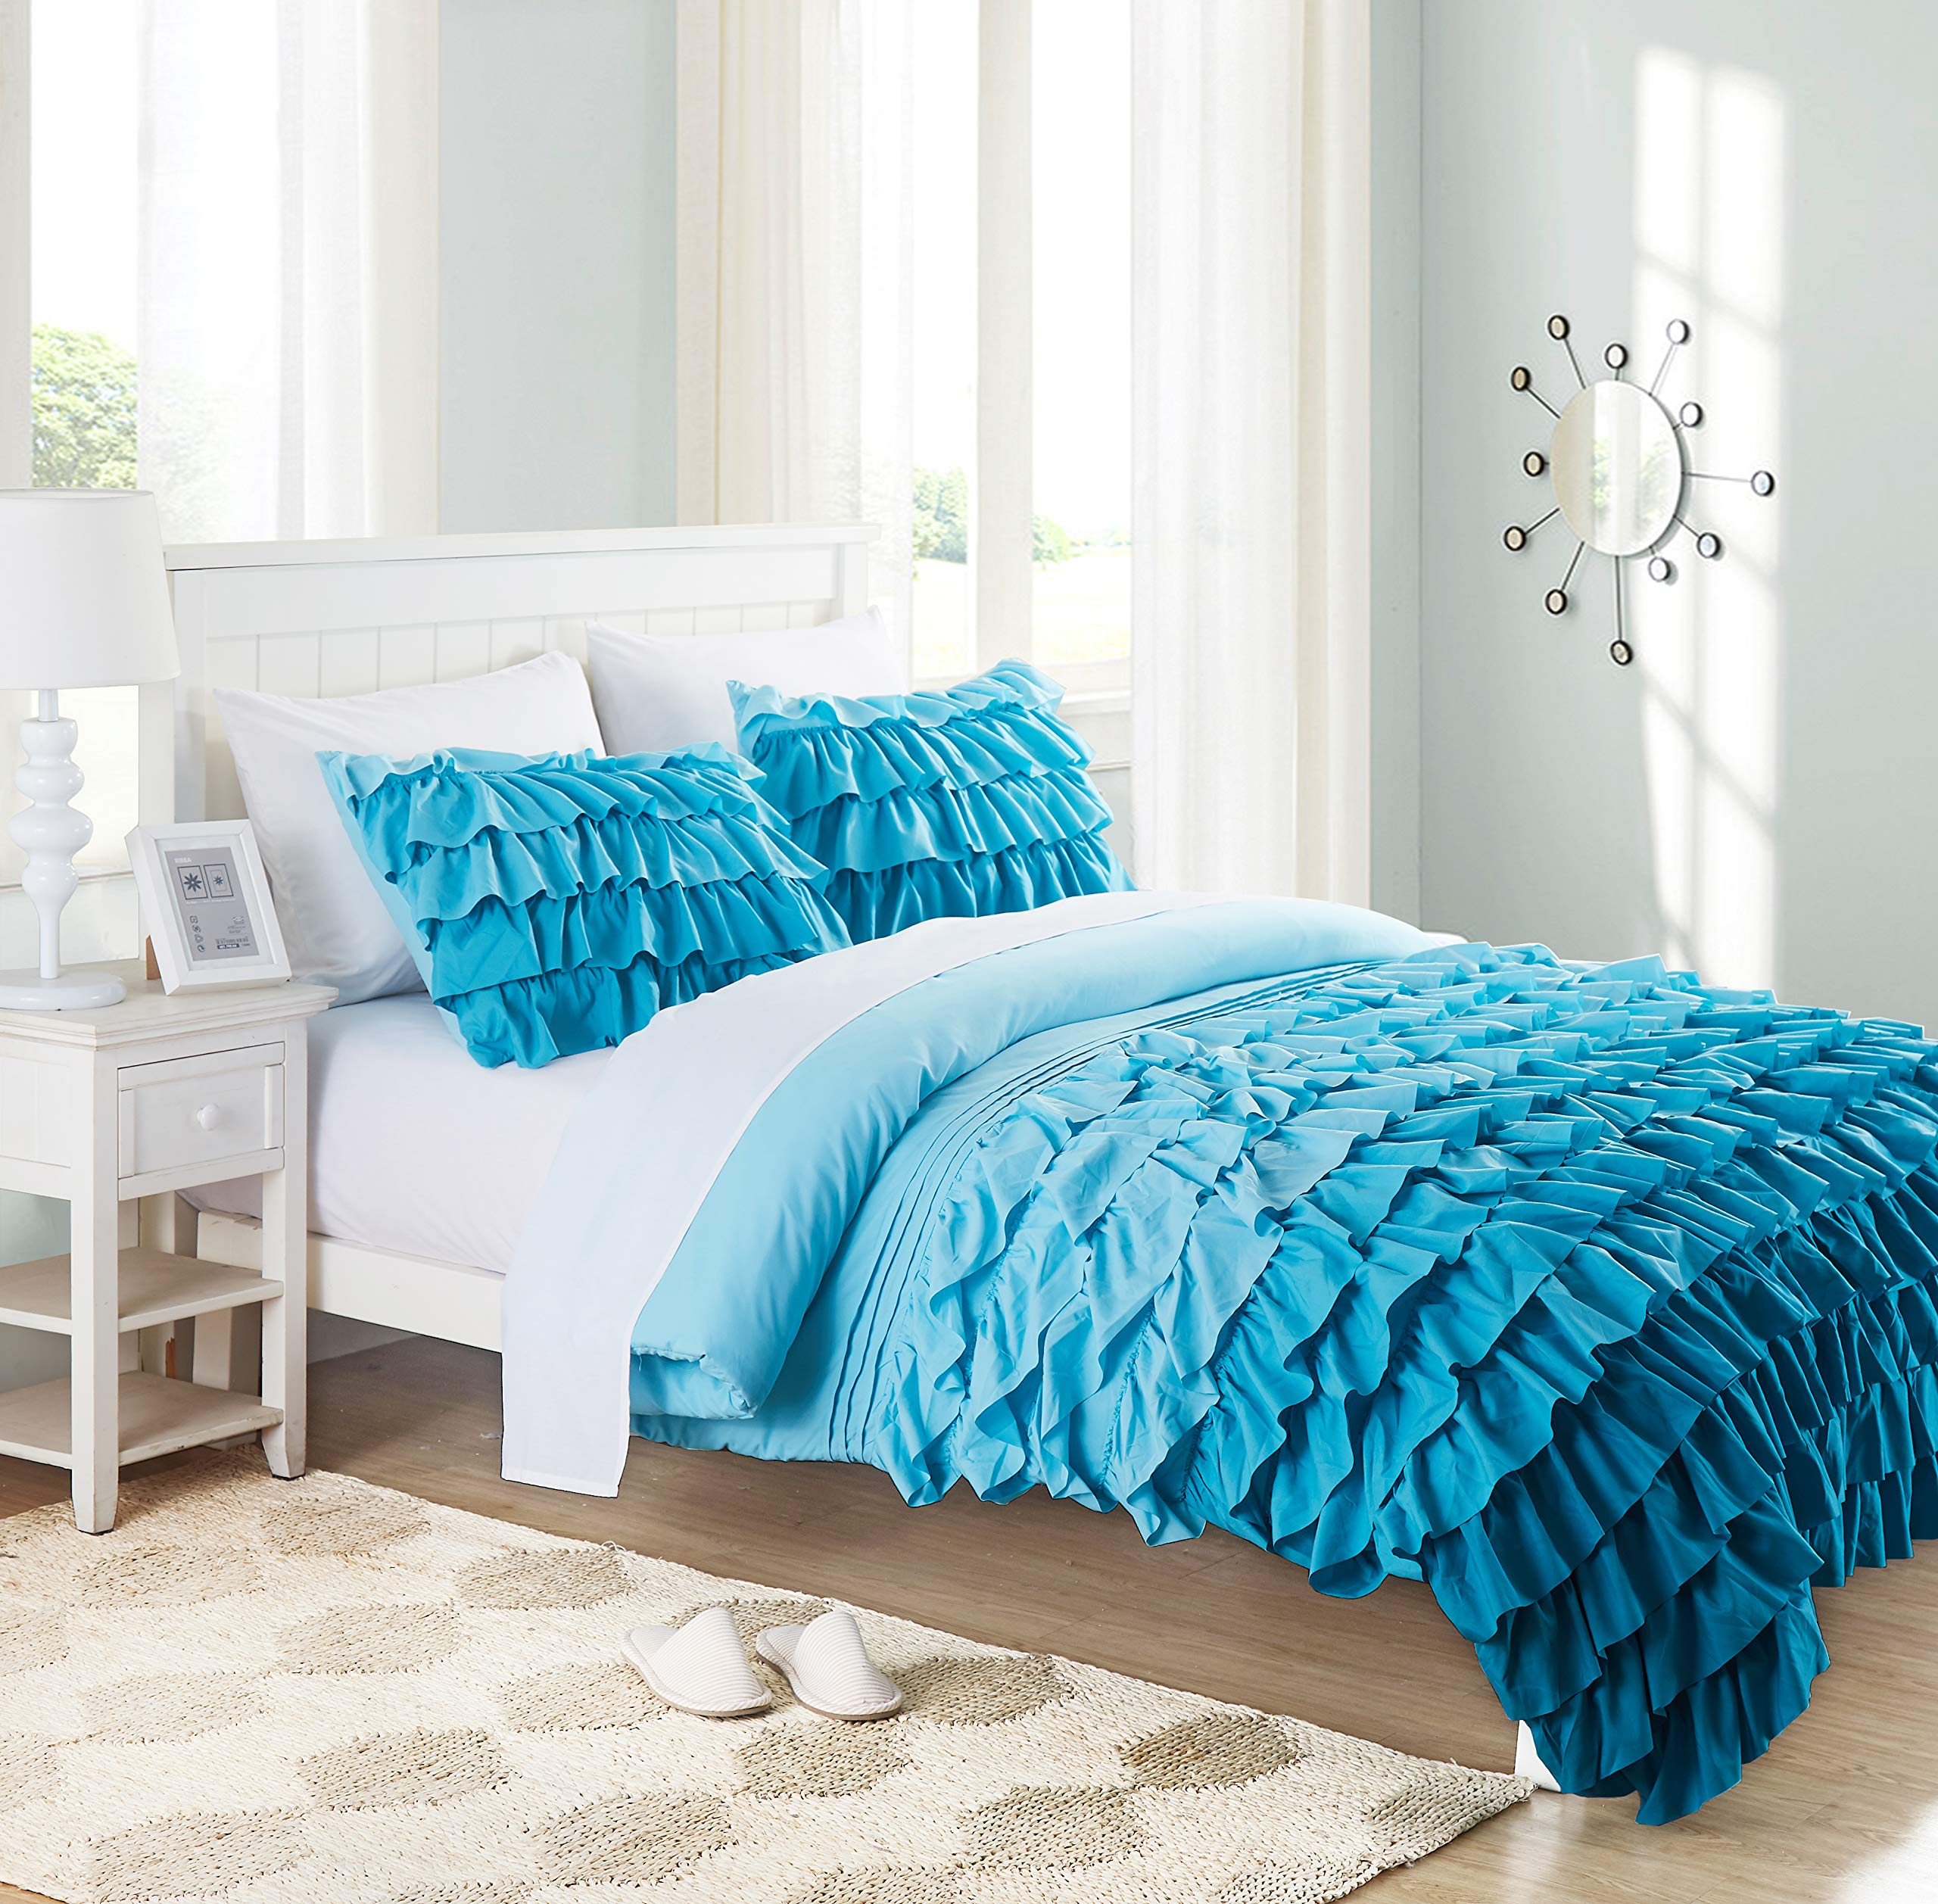 Cassiel Home Twin Comforter Sets For Girls Boys 3 Pcs Waterfall Ruffle Set Pinched Pleat Bedding Teen Kids Teal Buy Online In Kenya At Desertcart Co Ke Productid 138949527